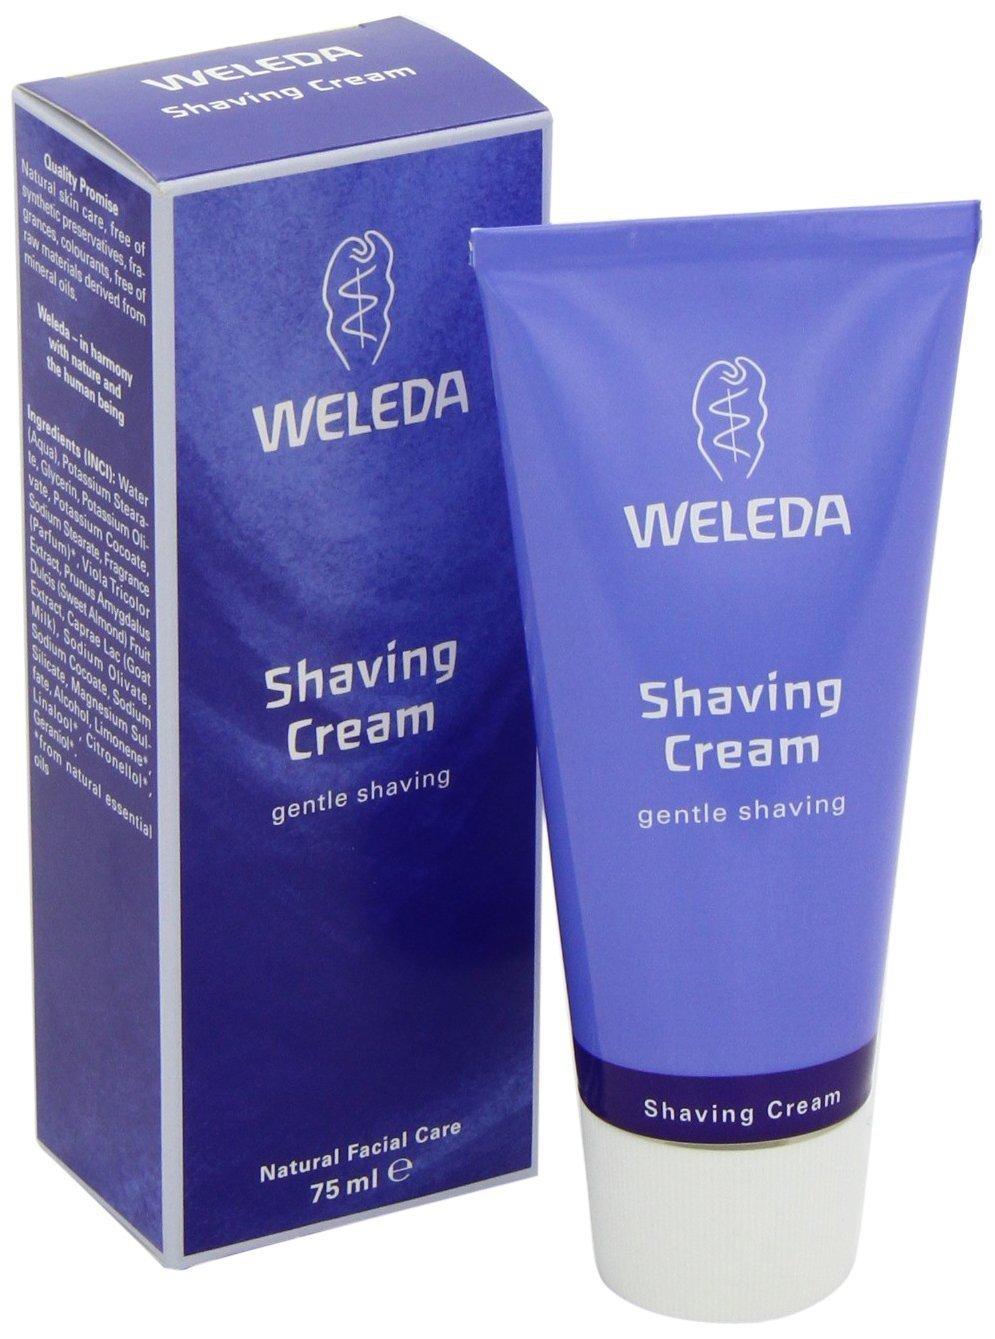 Weleda Shaving Cream (1x2.5Oz)